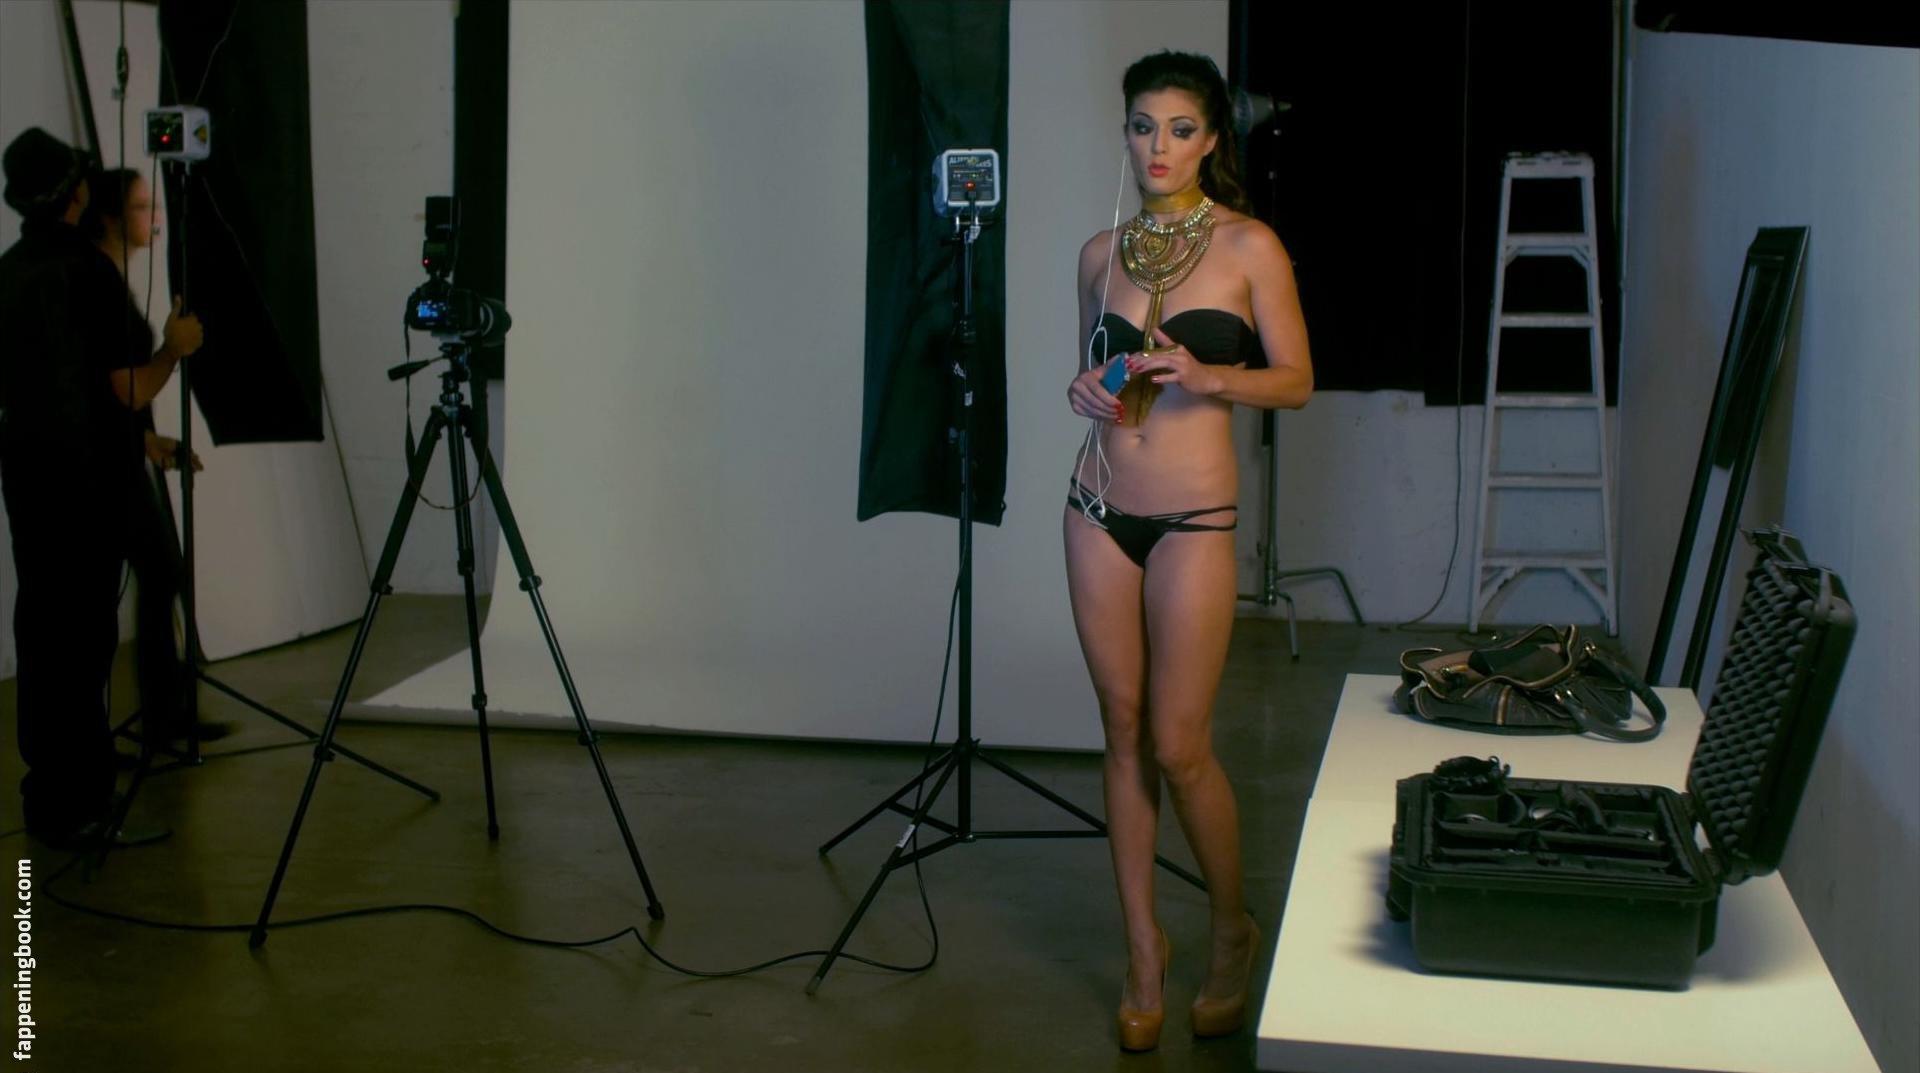 Angelica Chain Nude christina ulloa nude, sexy, the fappening, uncensored